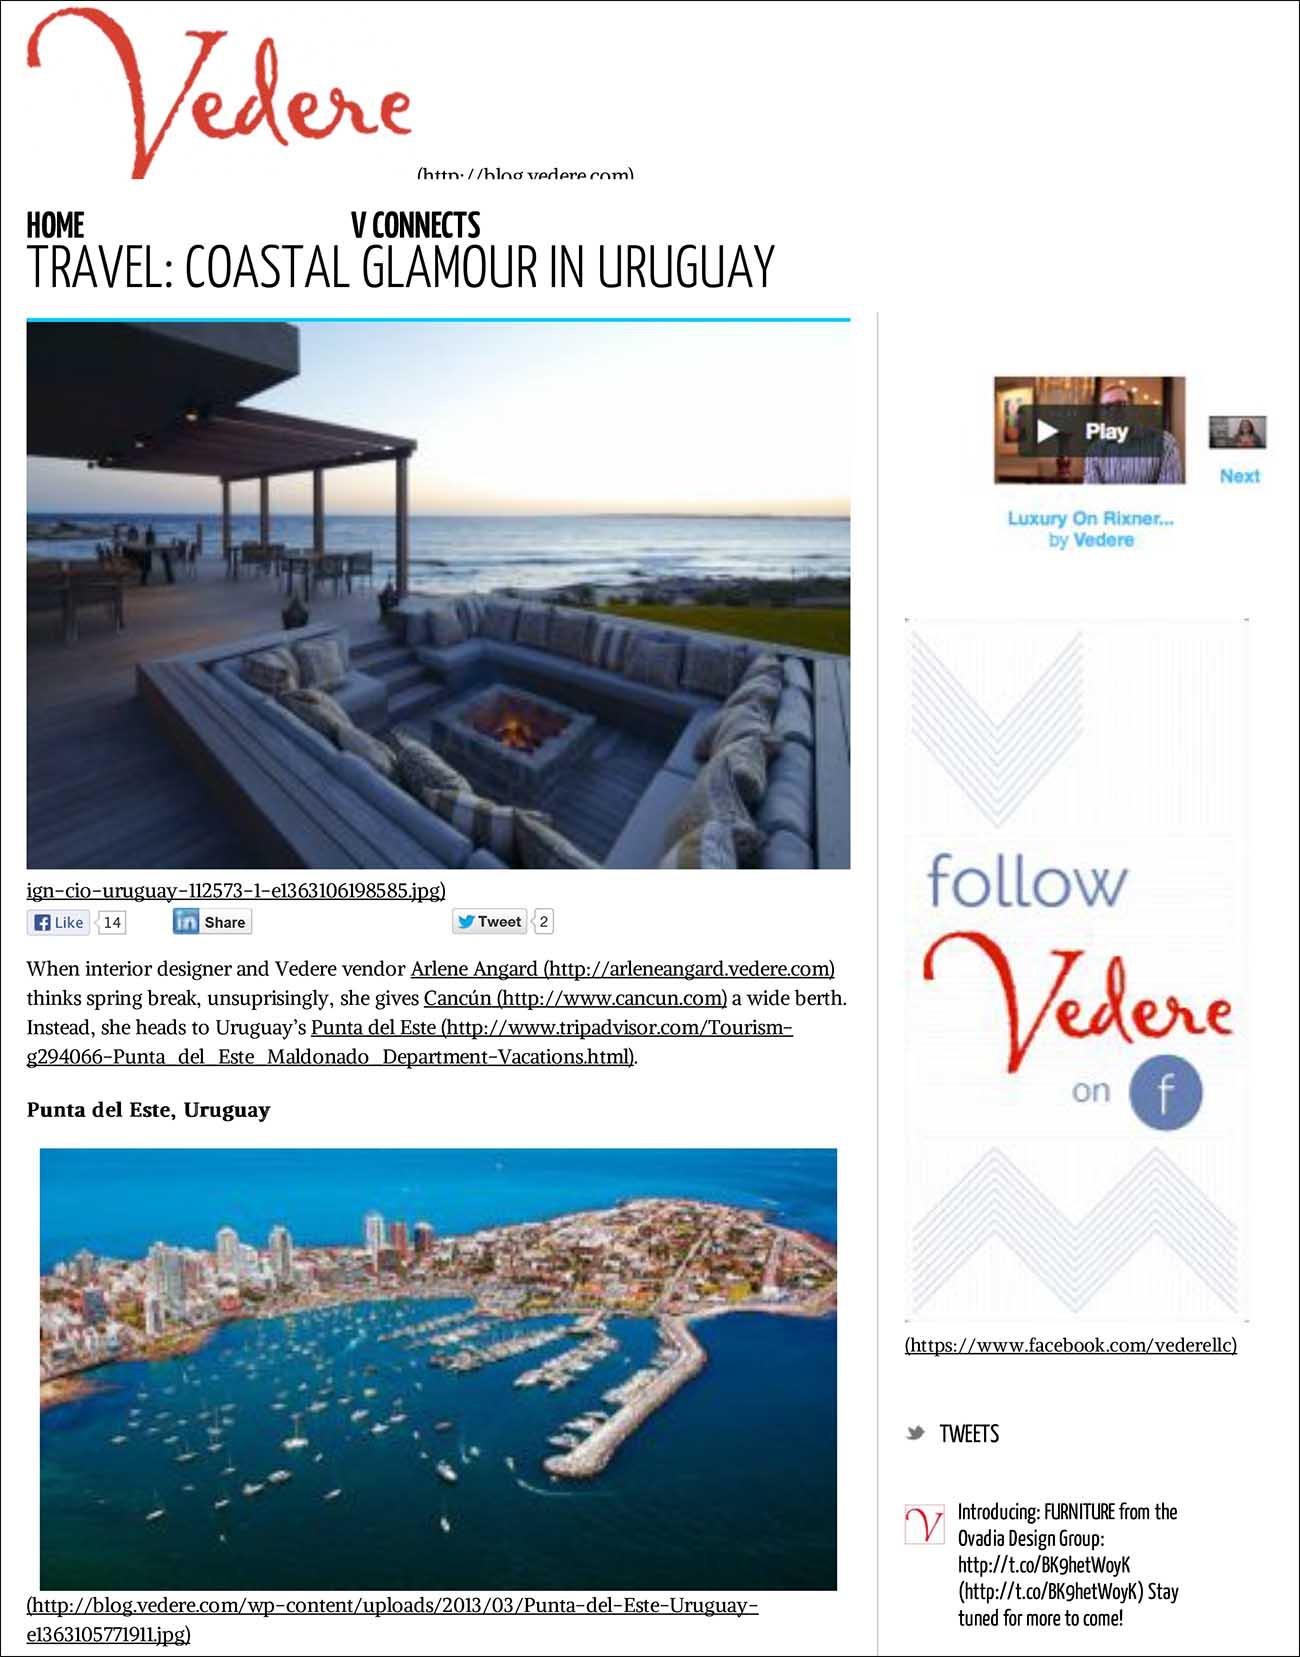 TraVel: Coastal Glamour in Uruguay - Vedere Blog